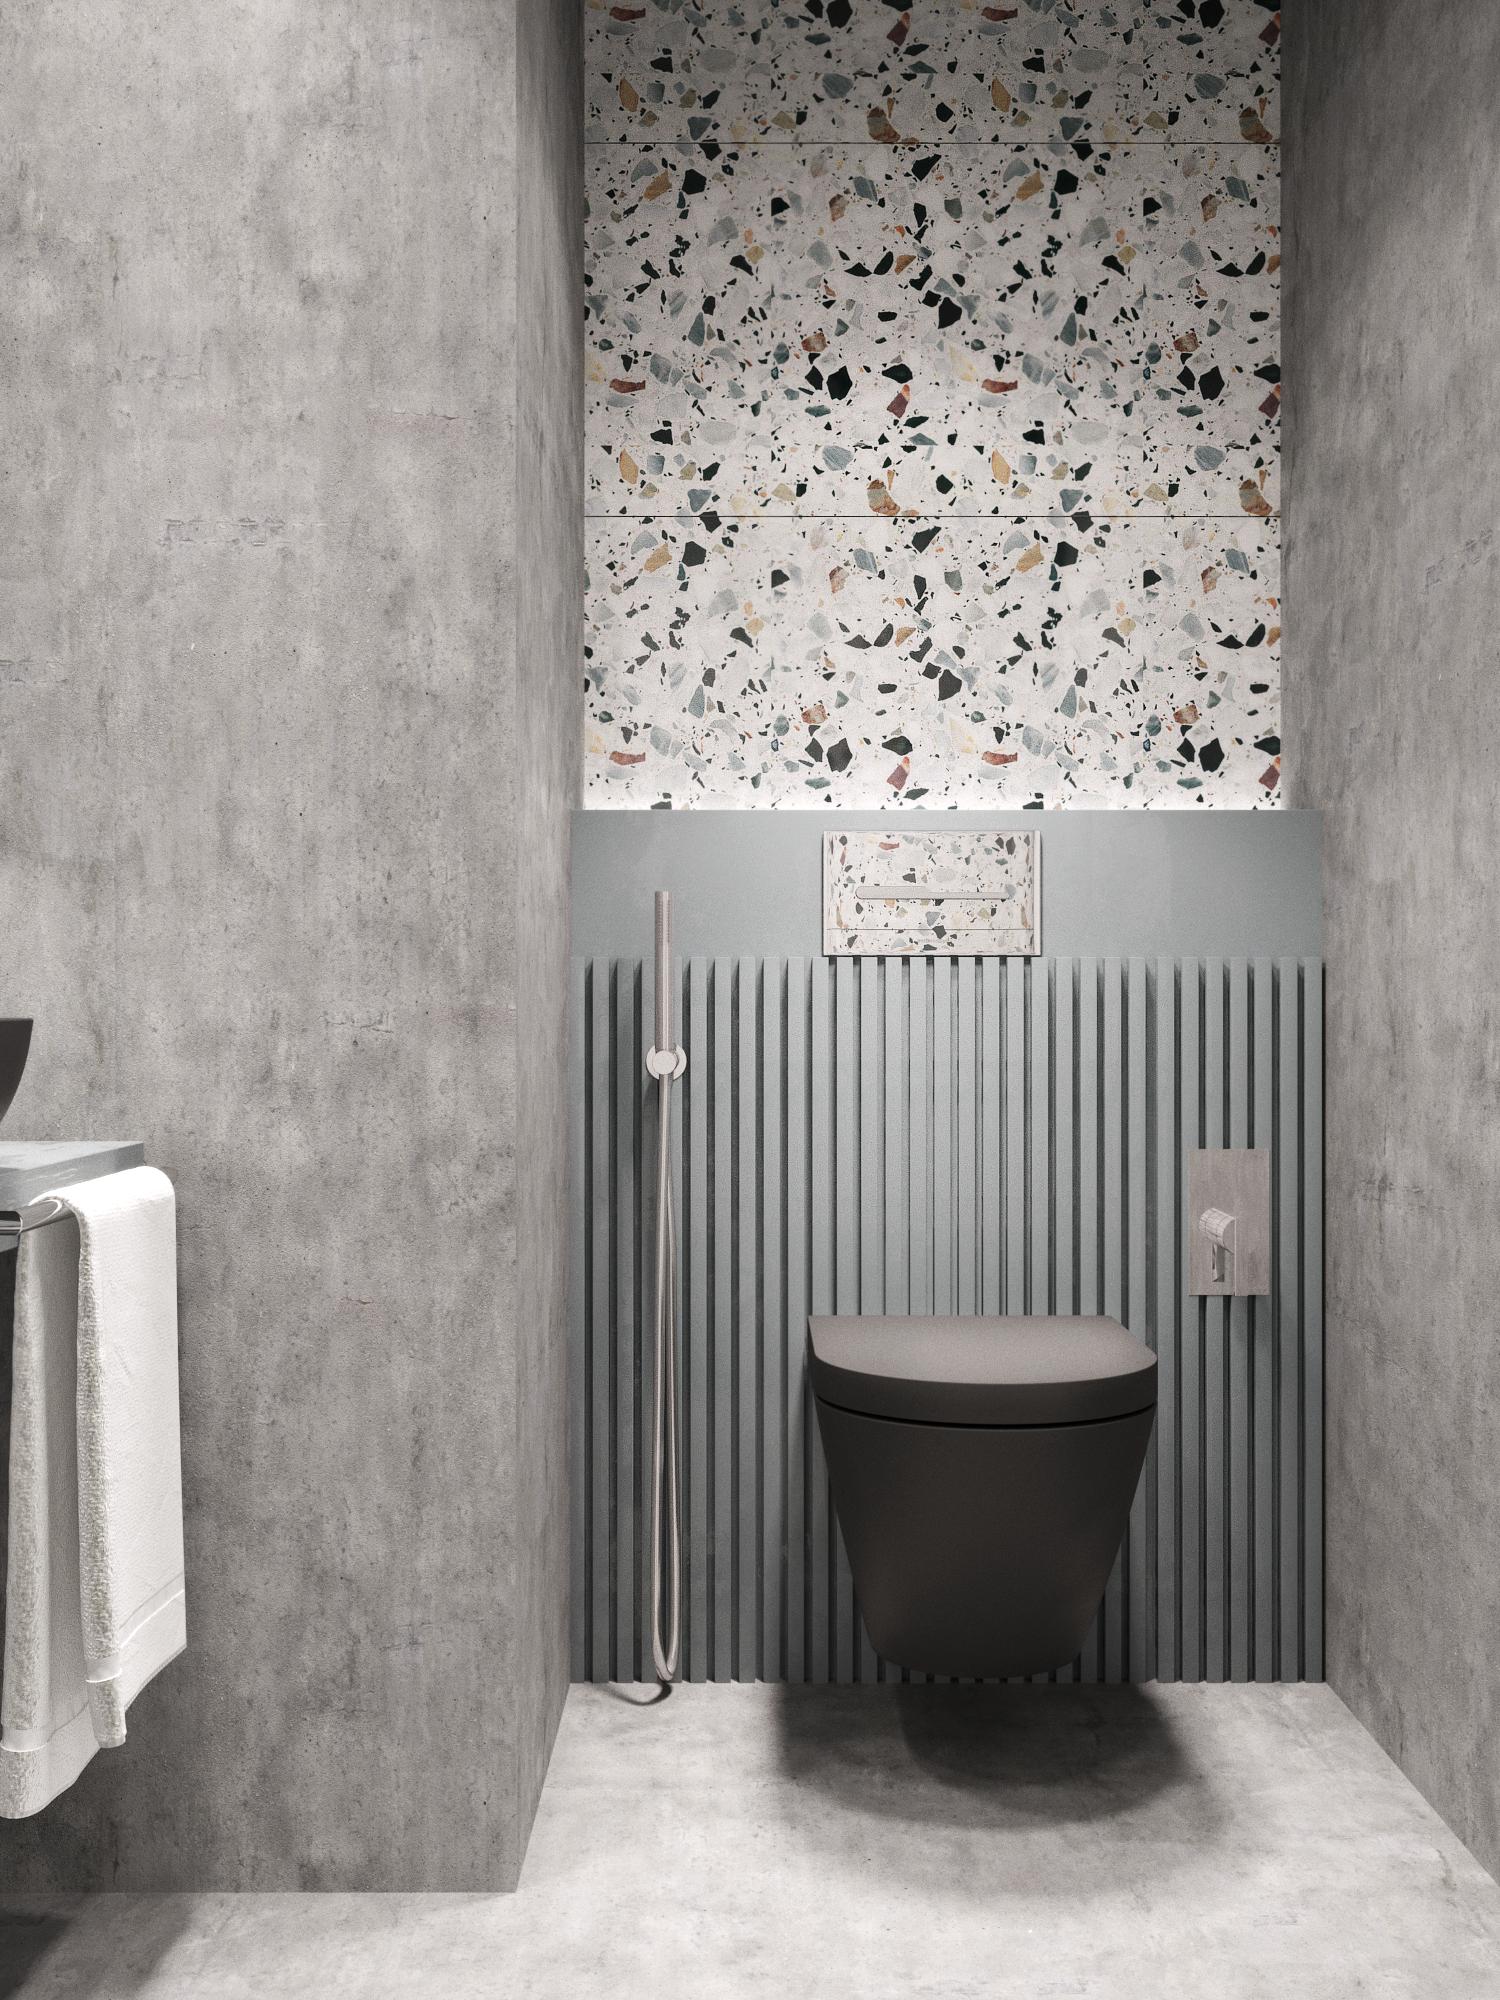 Pin by Sapir Ivri on Terrazzo   Pinterest   Interiors, Bathroom ...